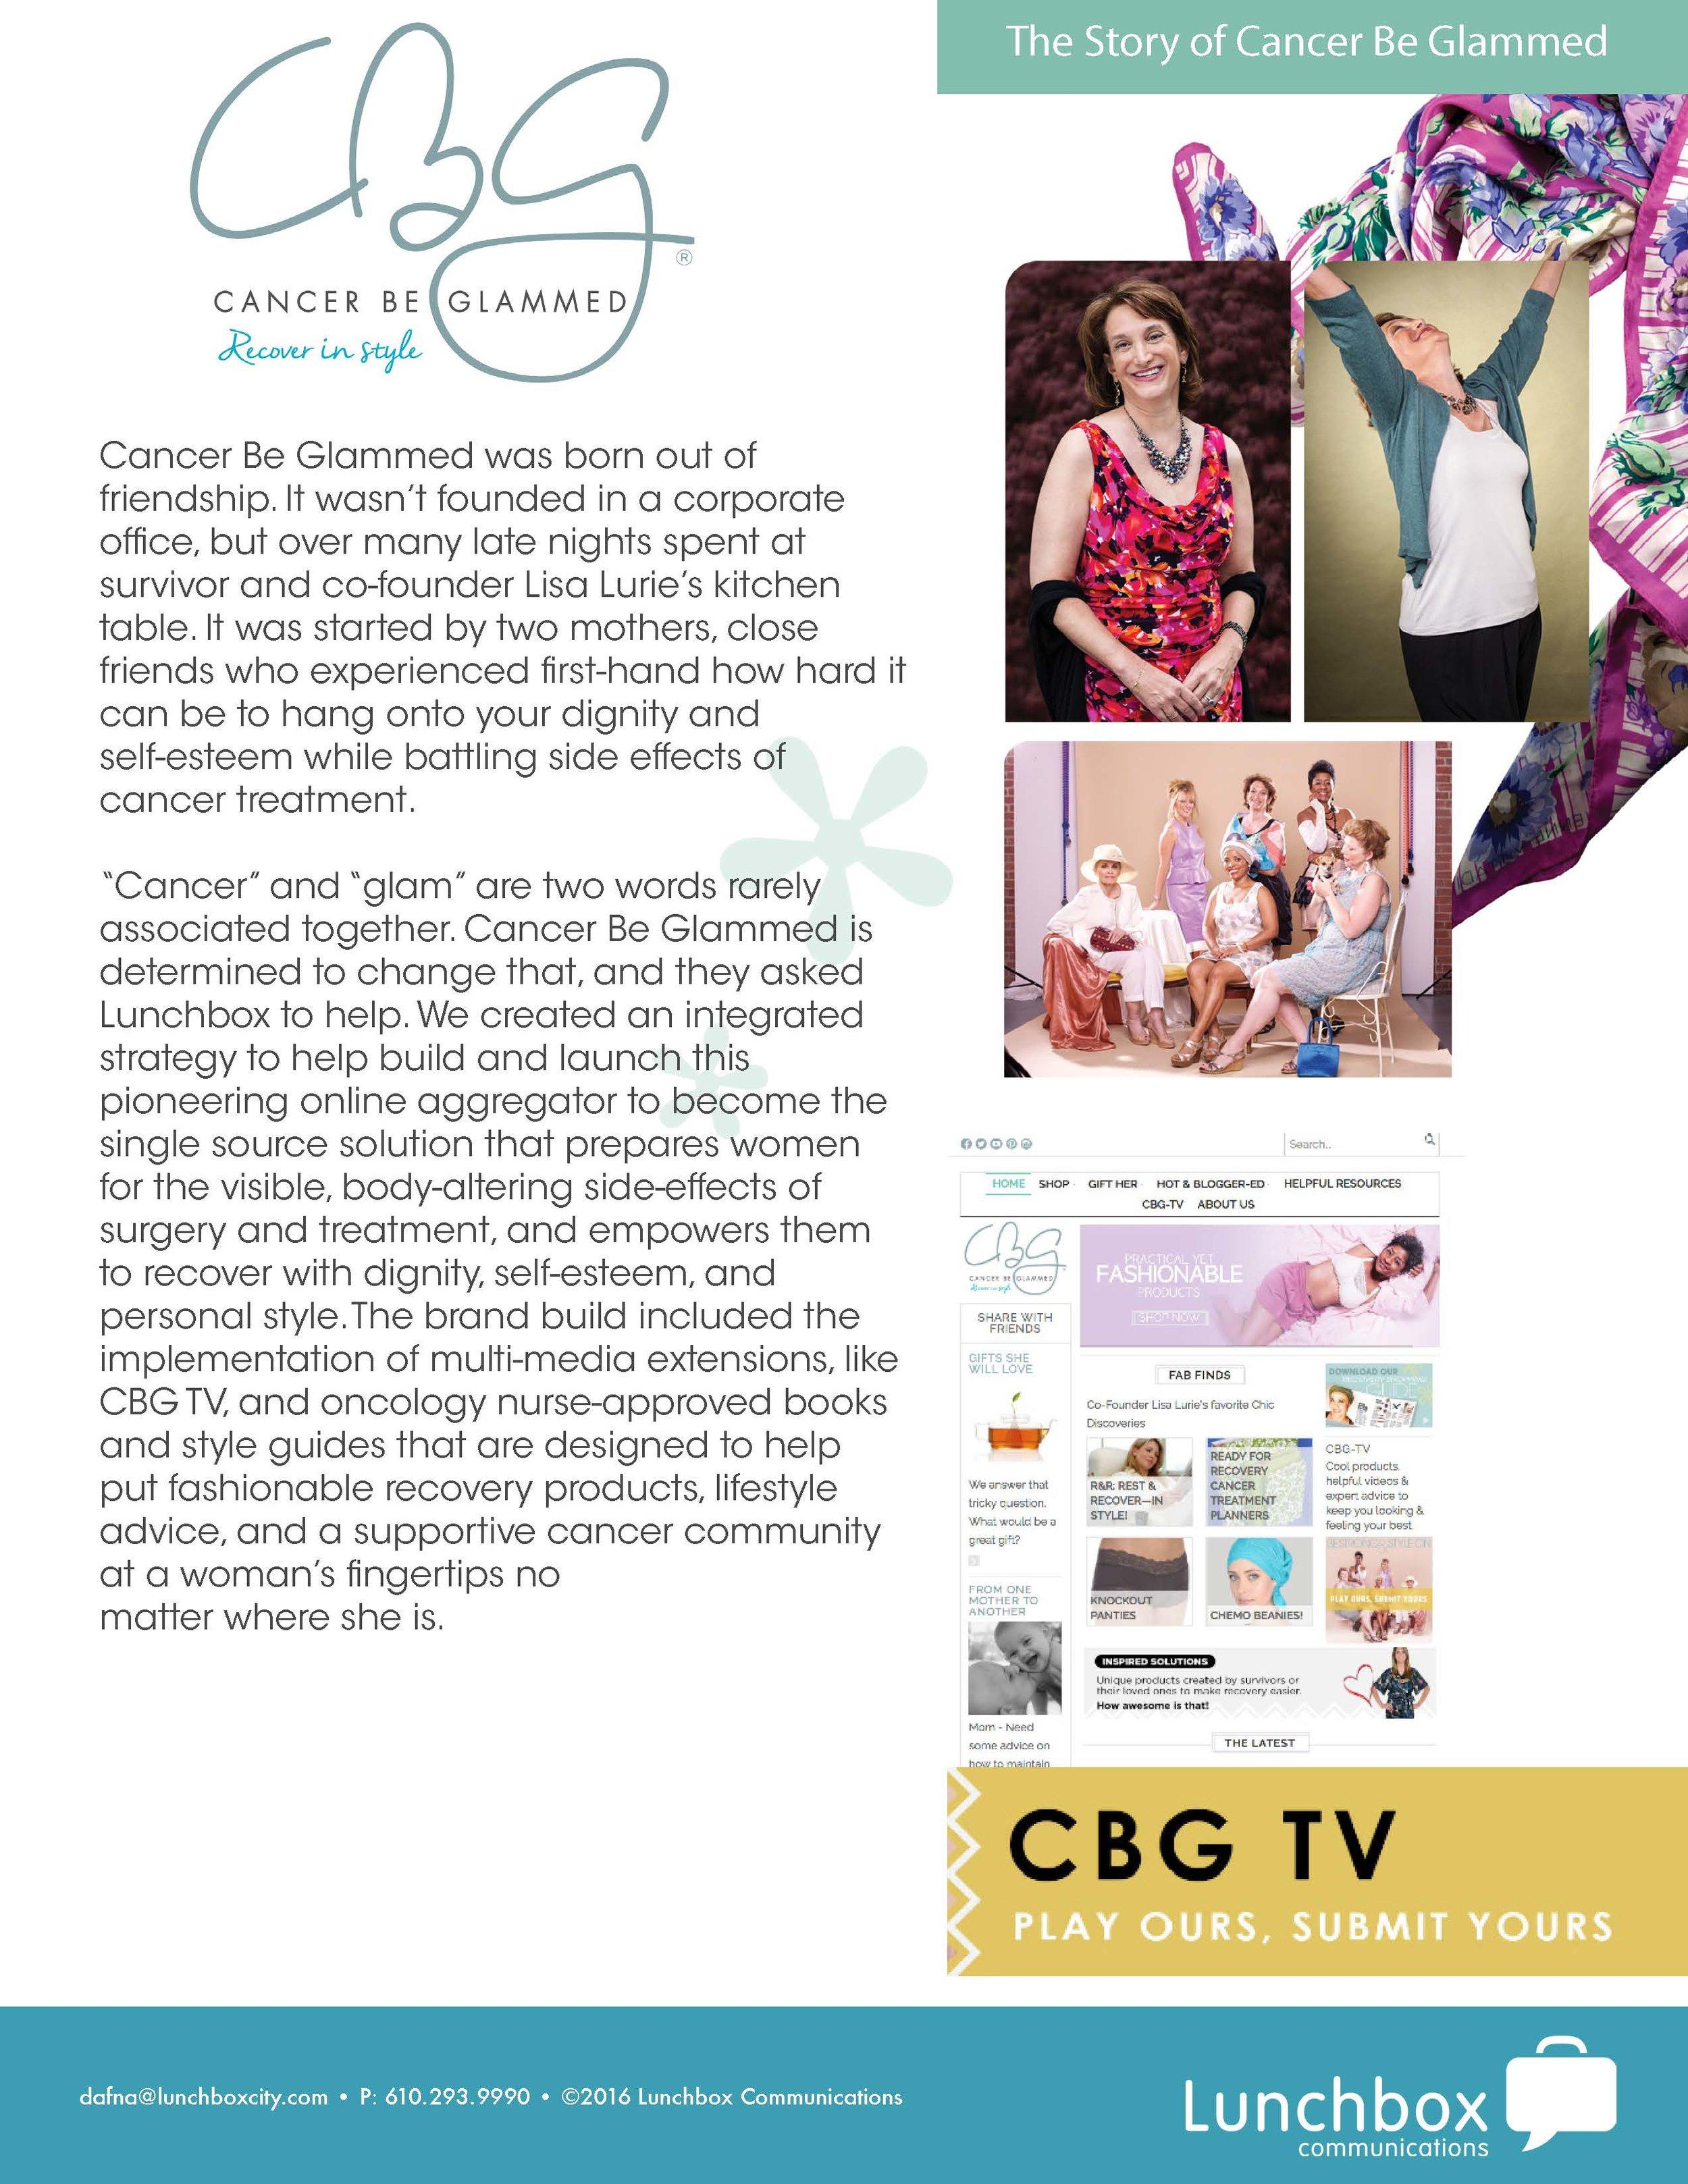 ADCP_Award_CBG_final (2)_Page_6.jpg